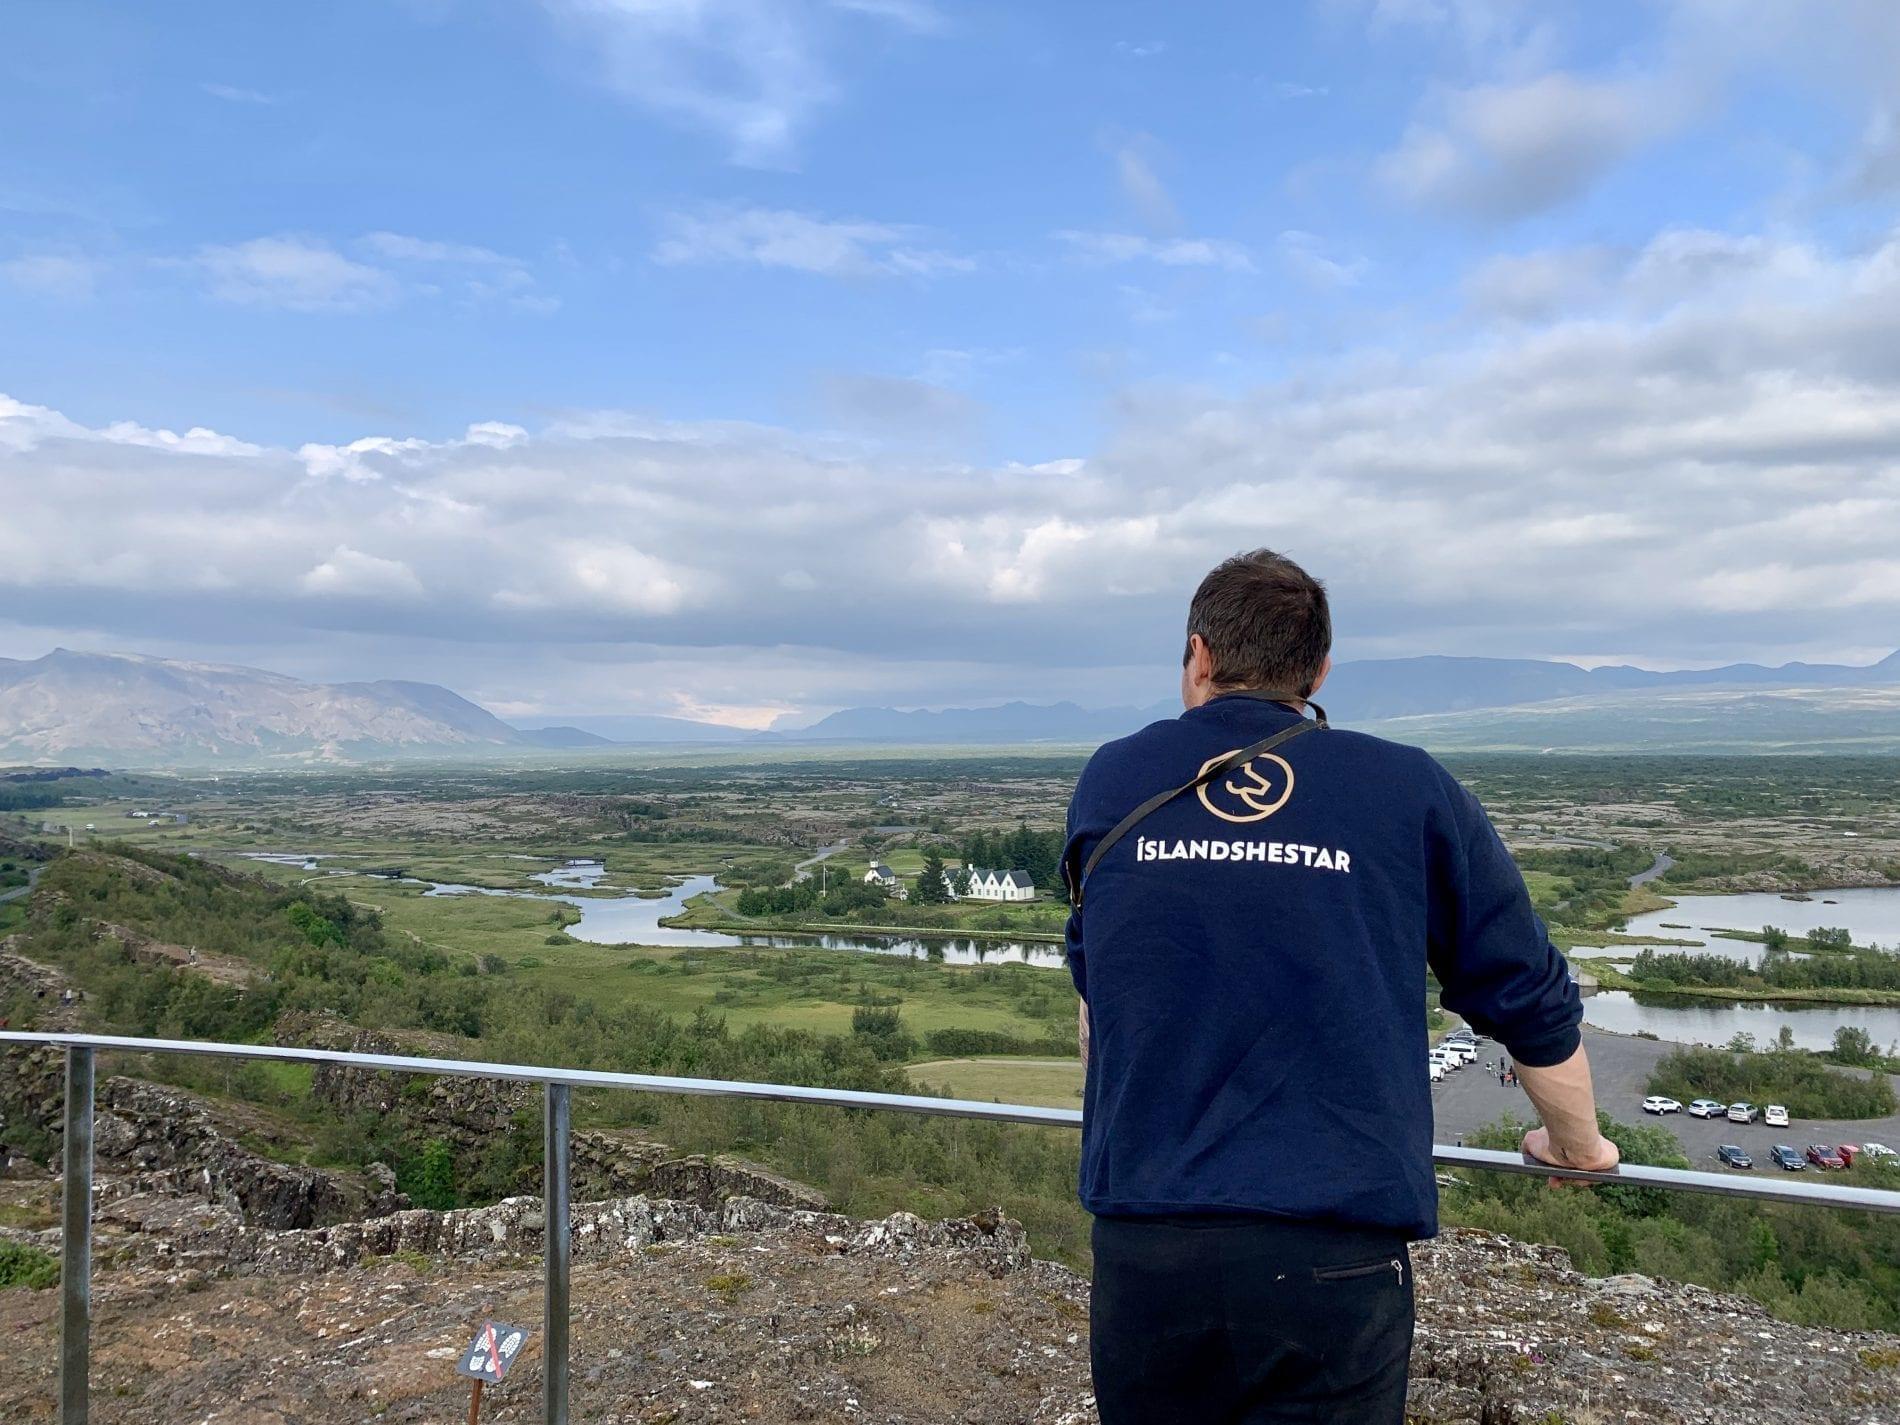 A man from Íslandshestar looks over the geographically and historically famous Þingvellir